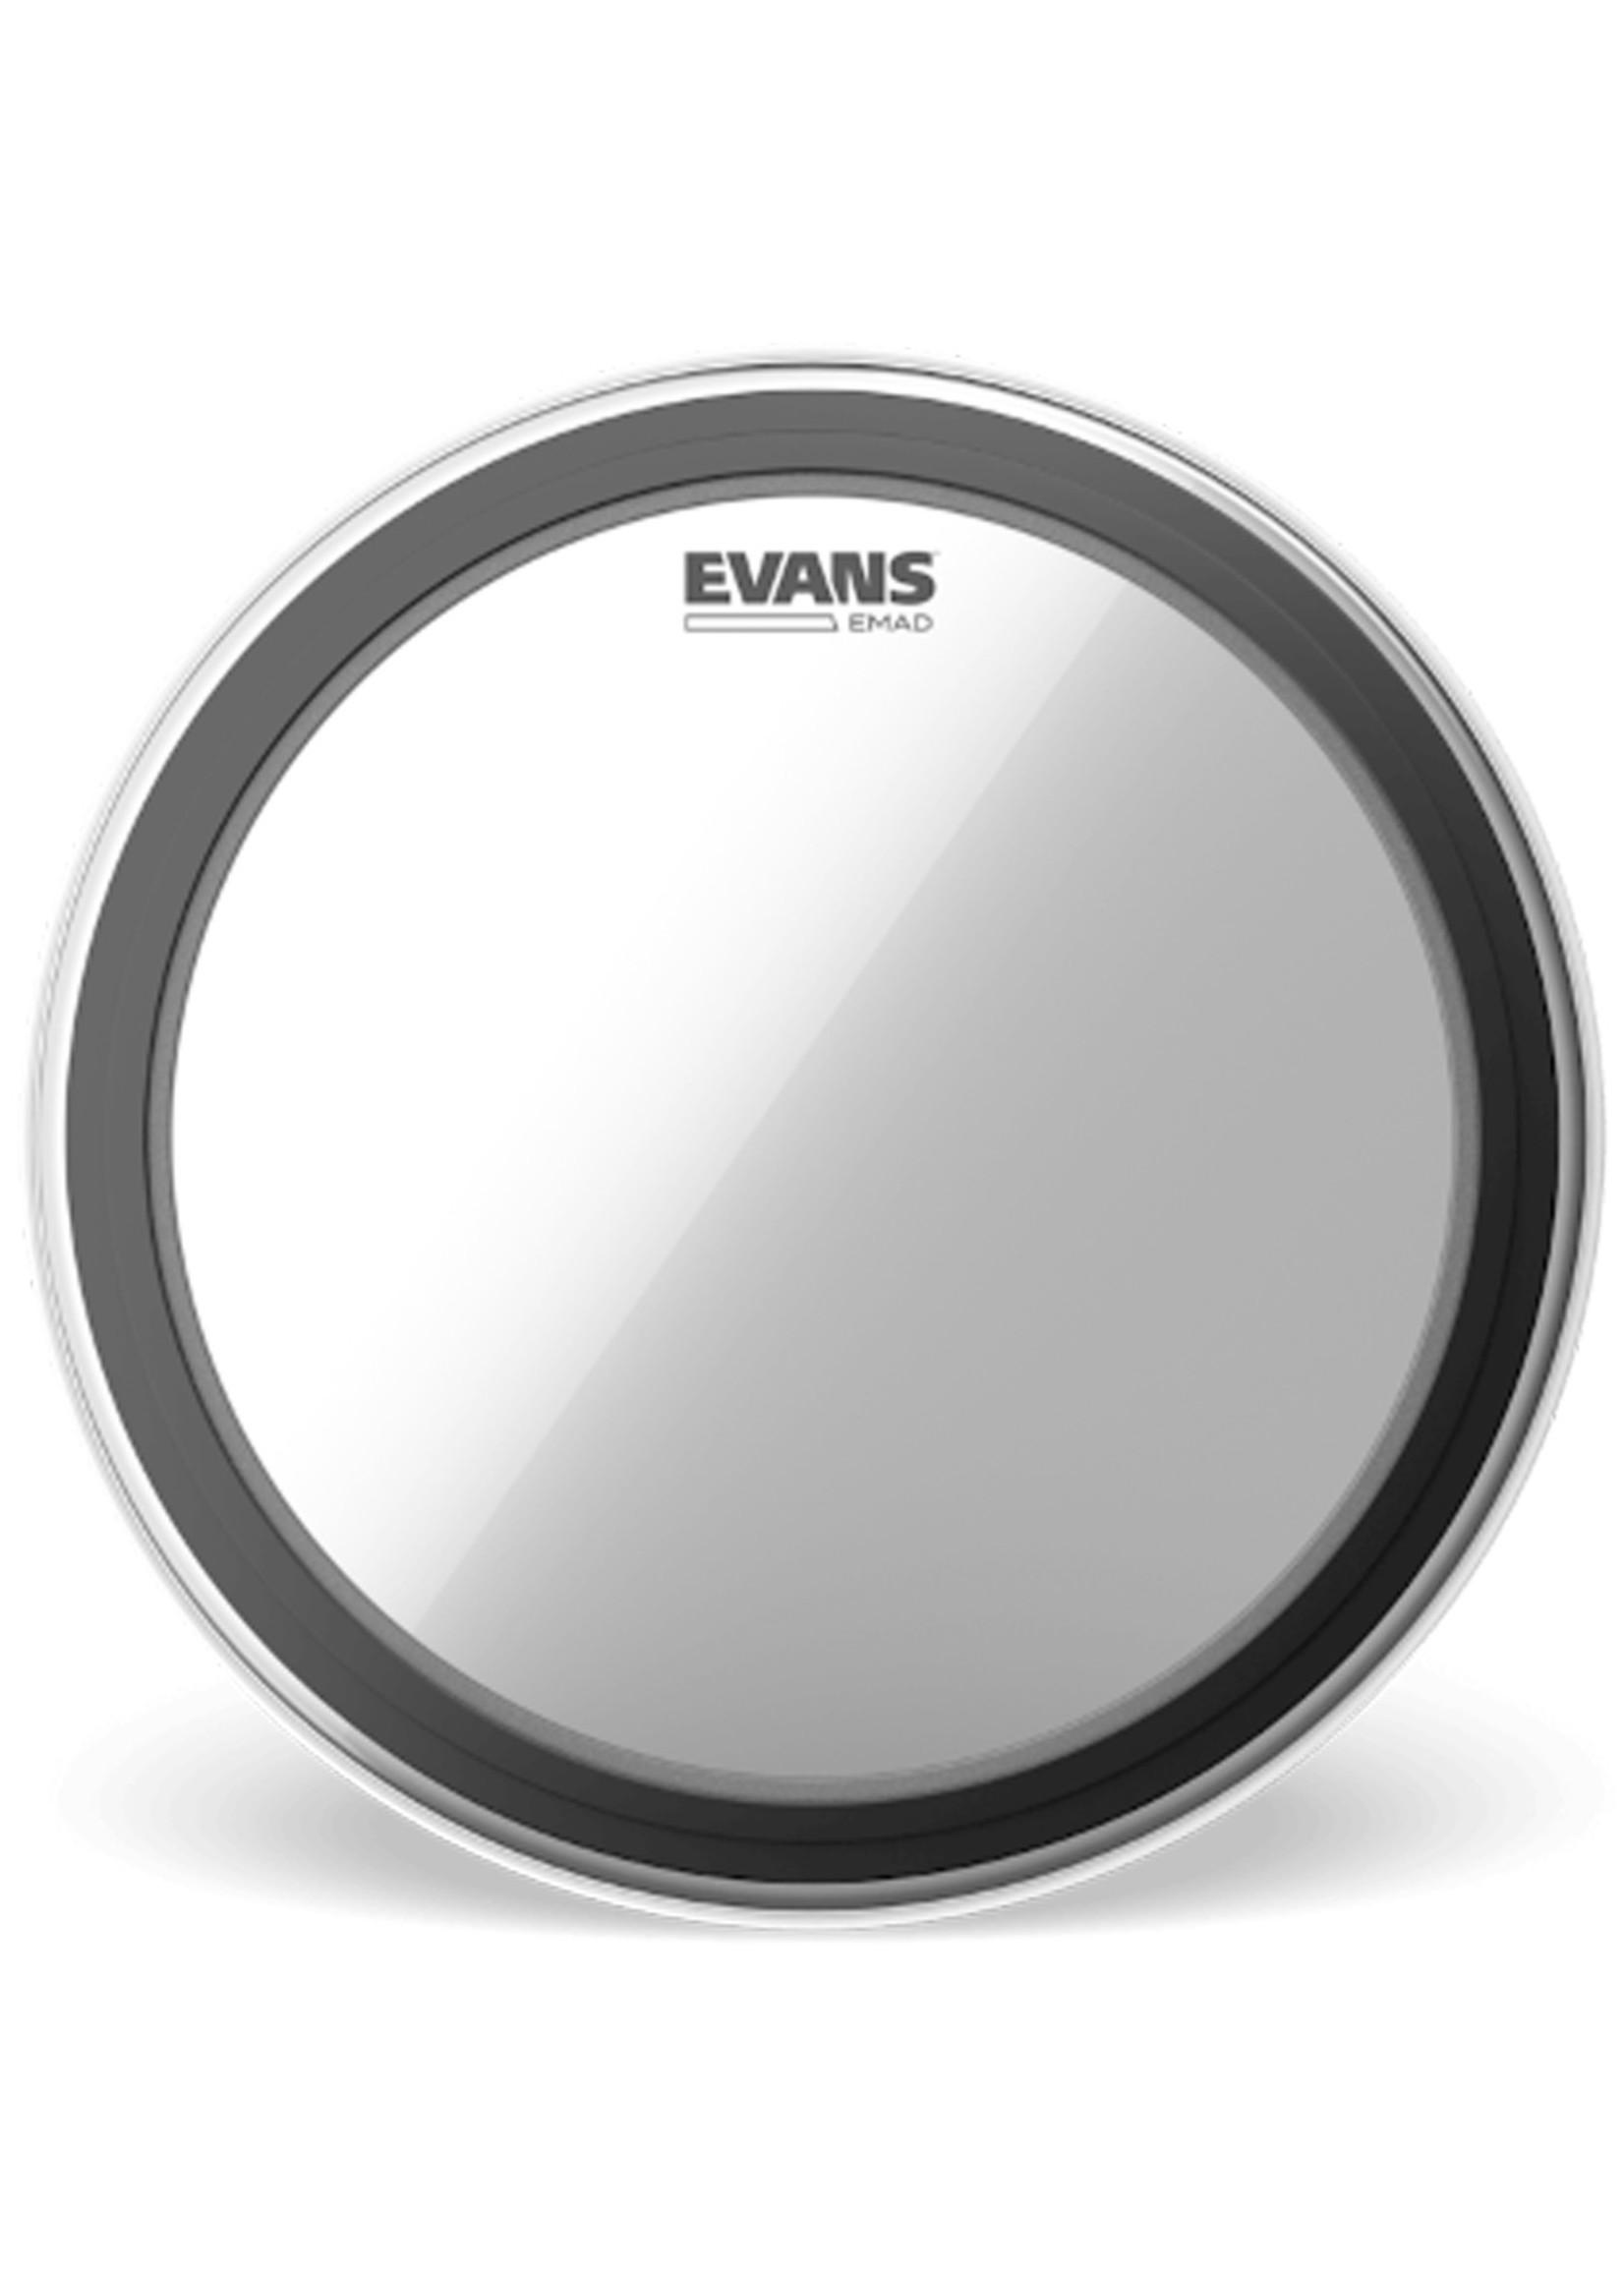 "Evans 22"" EMAD Clear Batter"